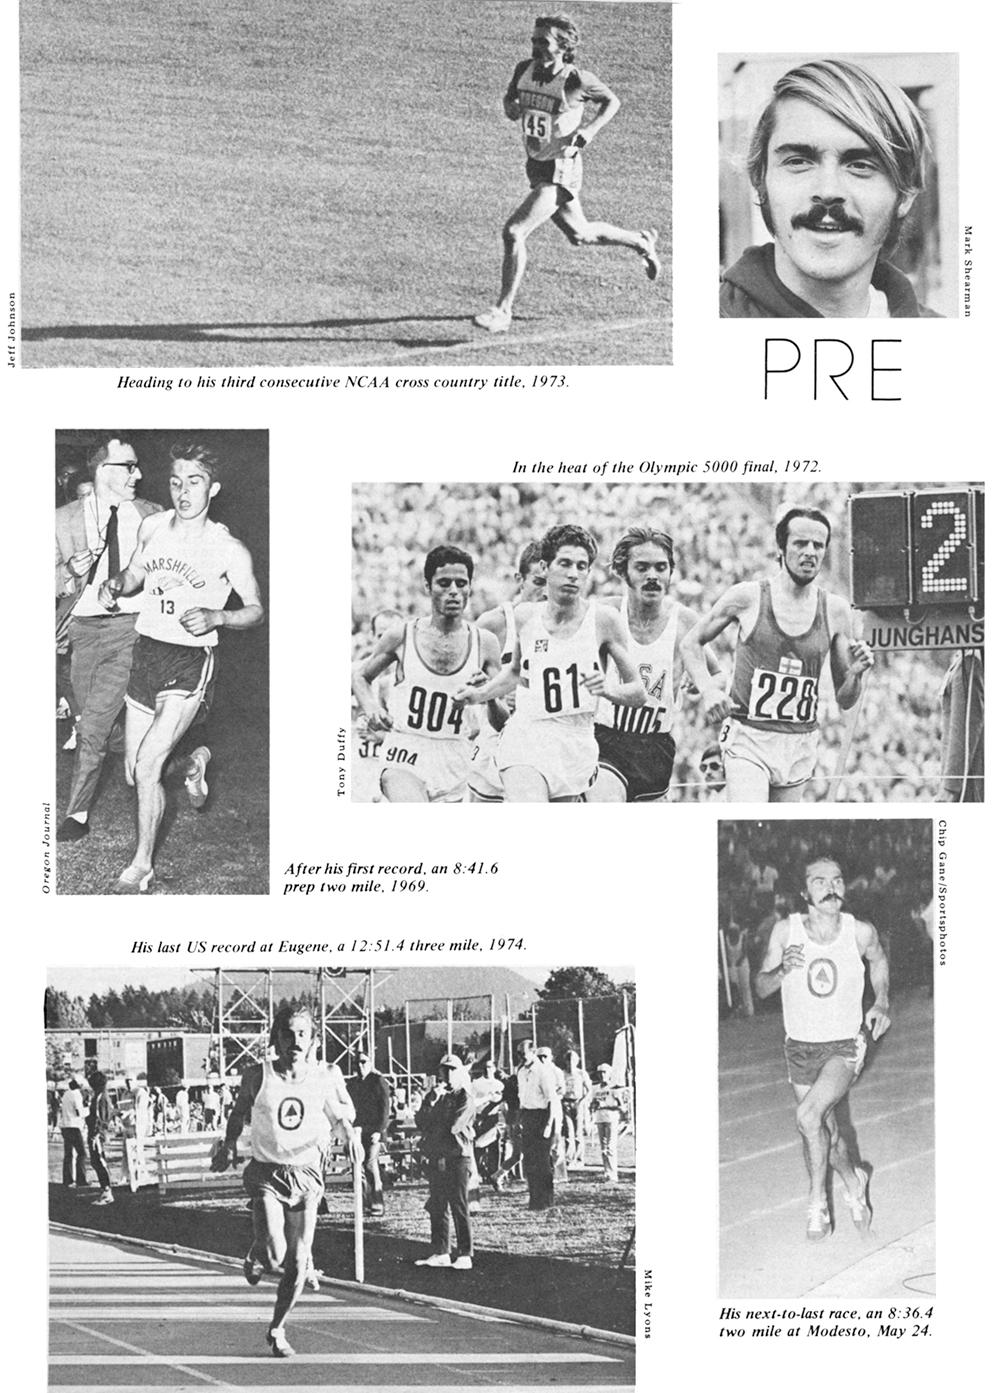 Pre19 03 The Pre Chronicles — Part 19, The Final Lap